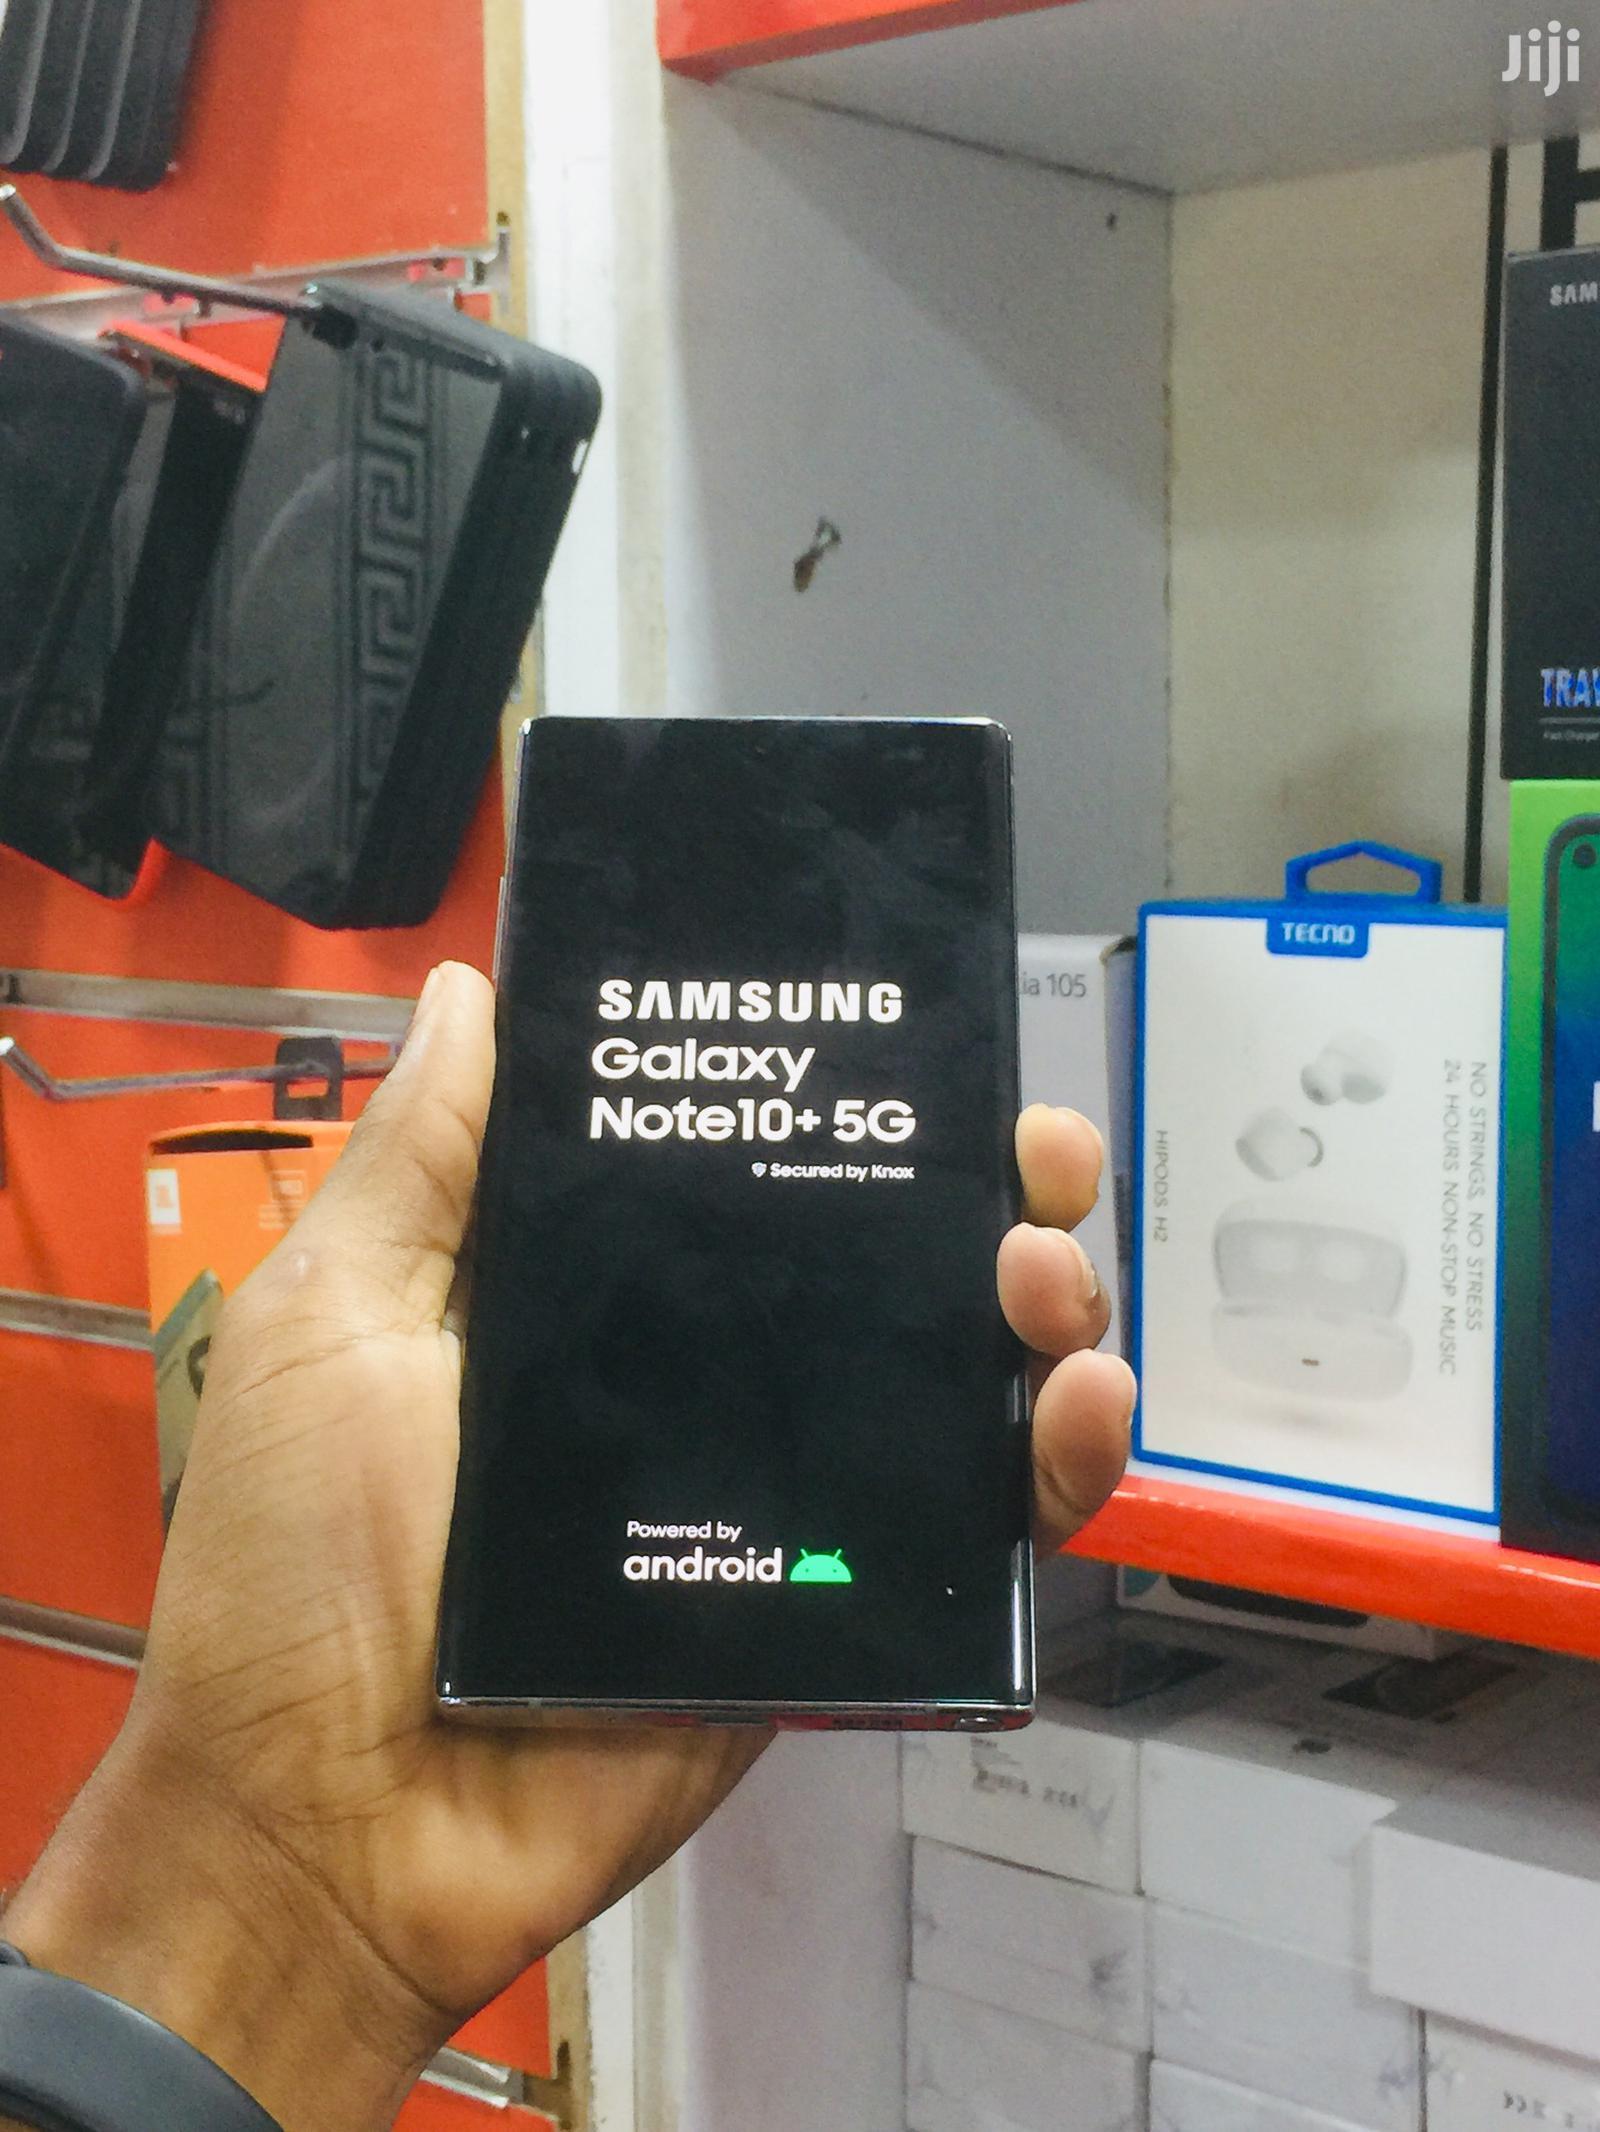 New Samsung Galaxy Note 10 Plus 5G 256 GB | Mobile Phones for sale in Kinondoni, Dar es Salaam, Tanzania